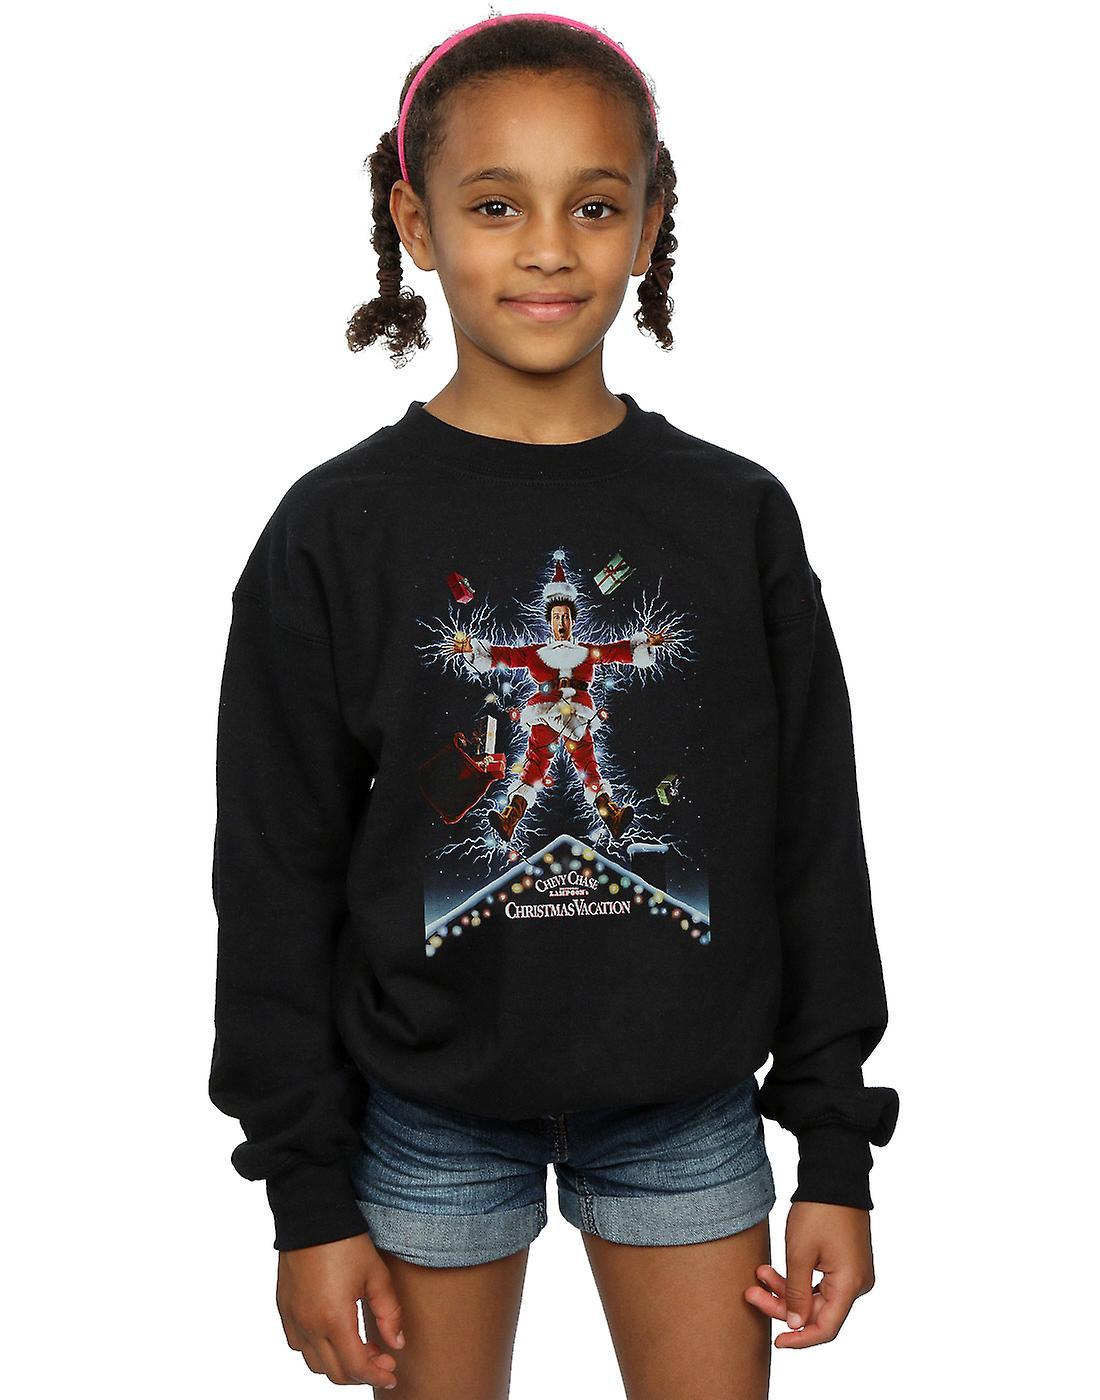 National Lampoon's Christmas Vacation Girls Poster Sweatshirt